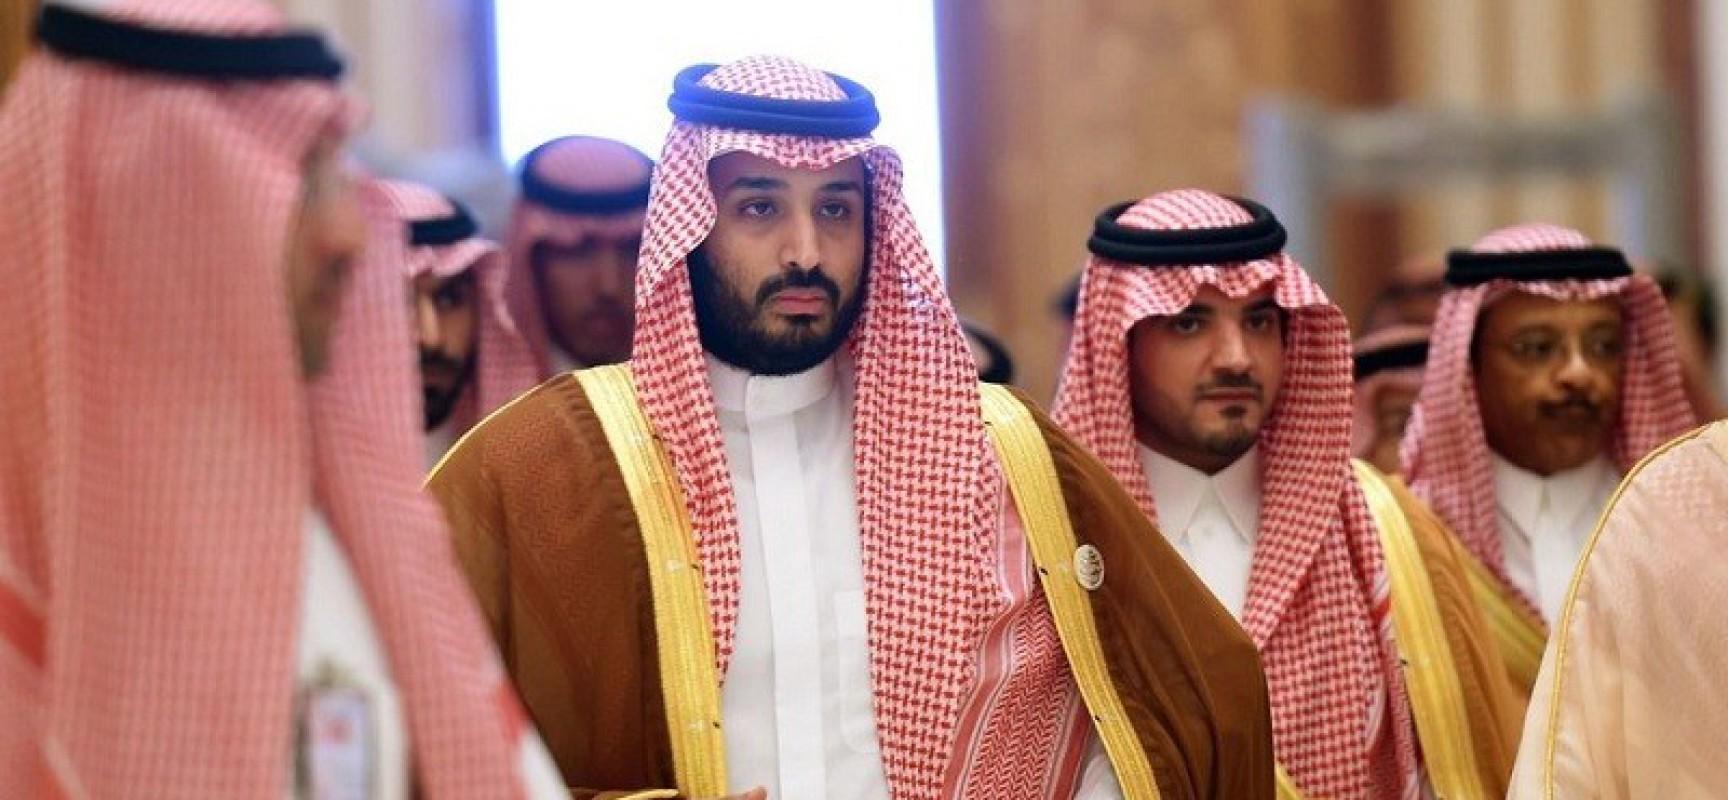 800 milliards de dollars confisqués en Arabie Saoudite